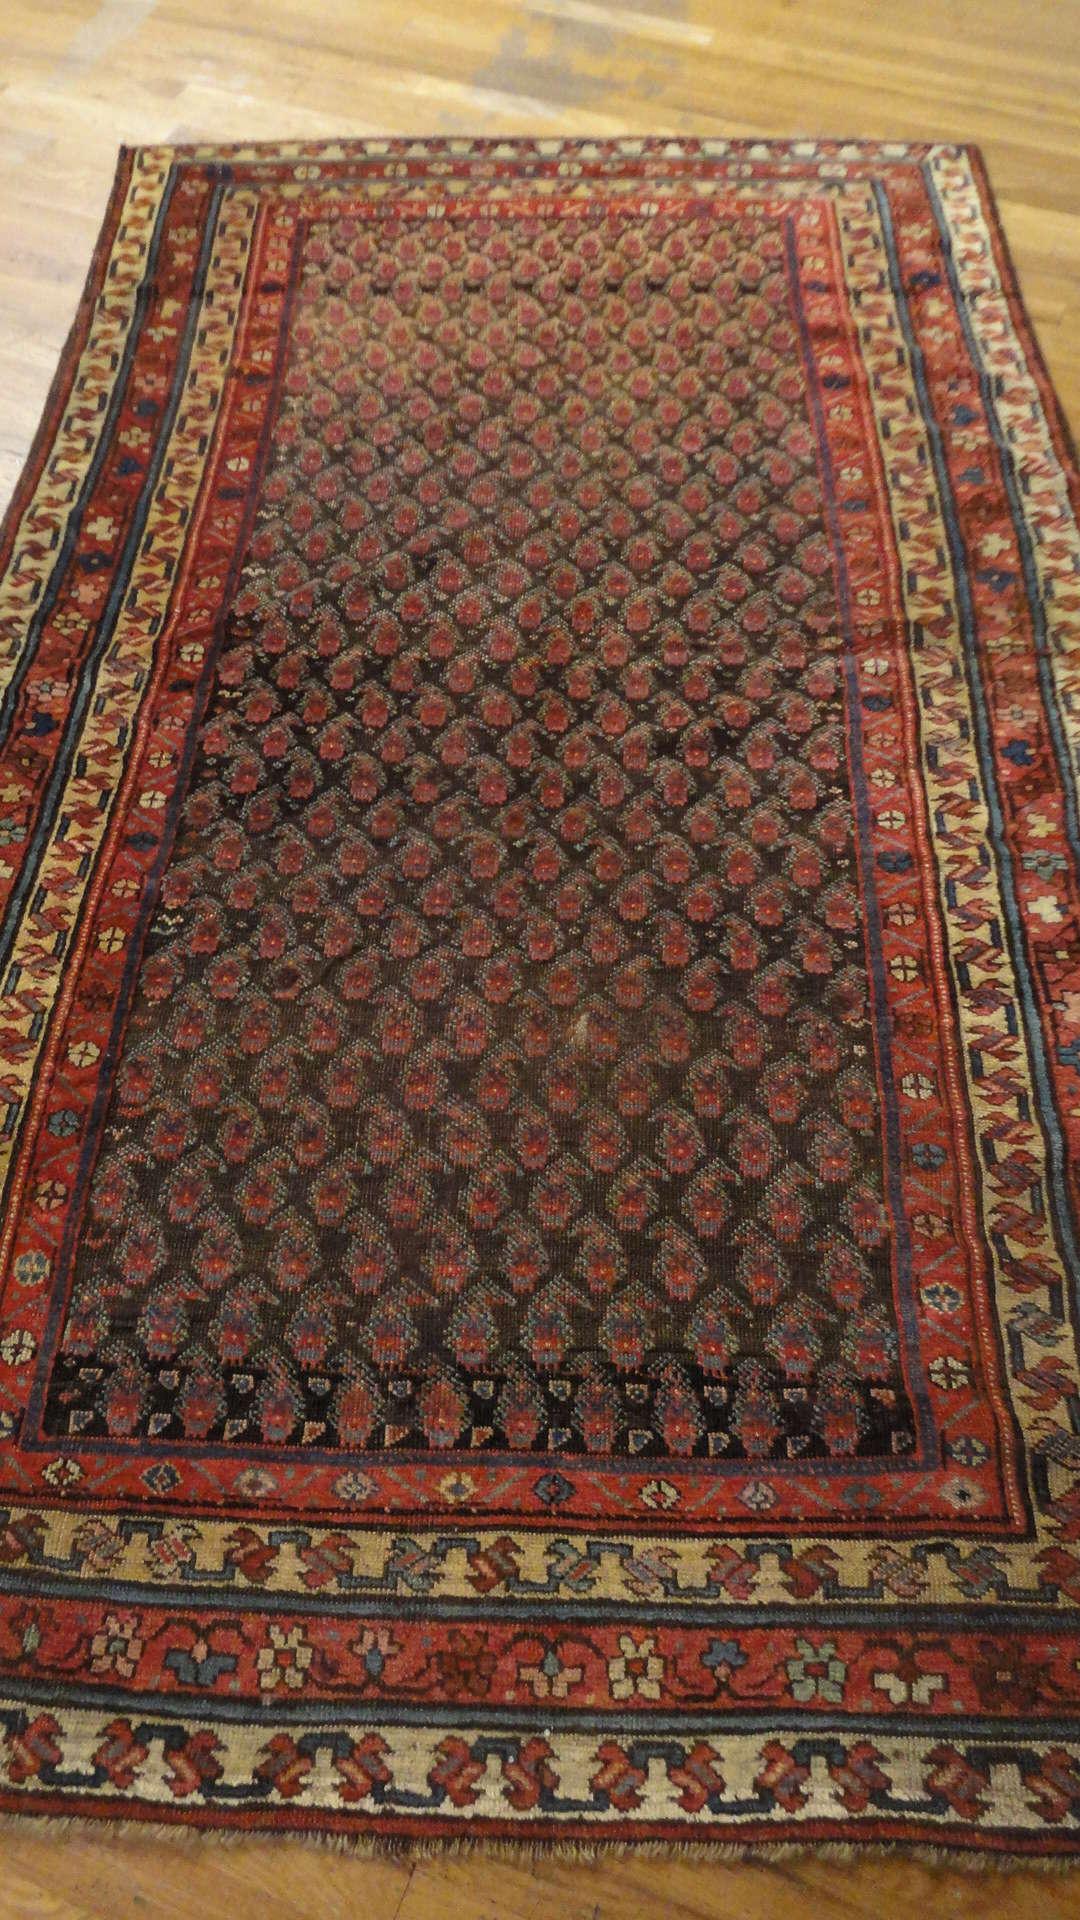 24566 antique persian kurd rug 5x8